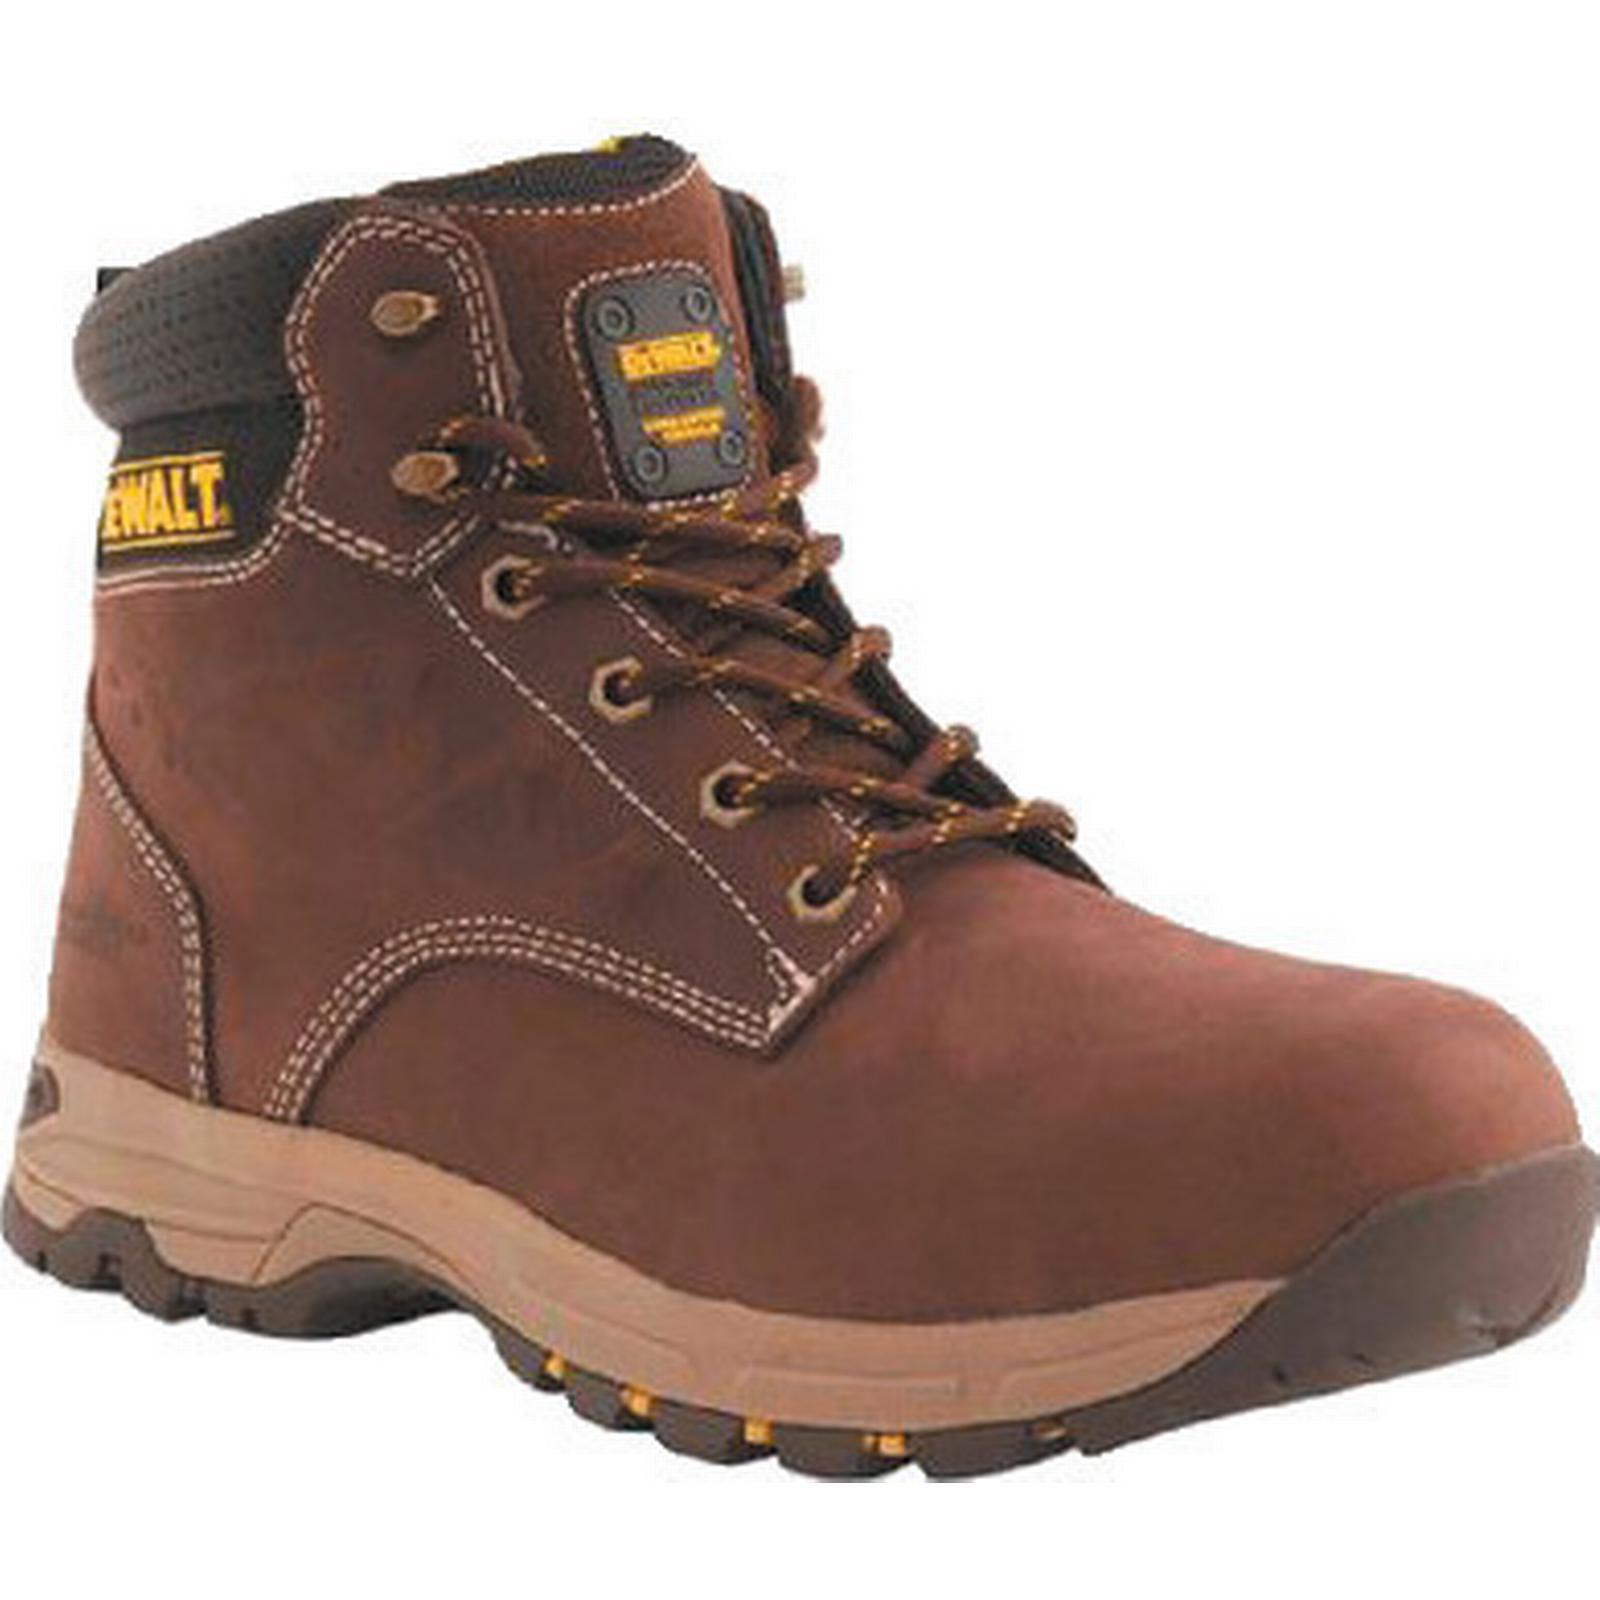 Dewalt Carbon Flexi Brown Size Hiker Safety Boots - Size Brown 8 2987f0